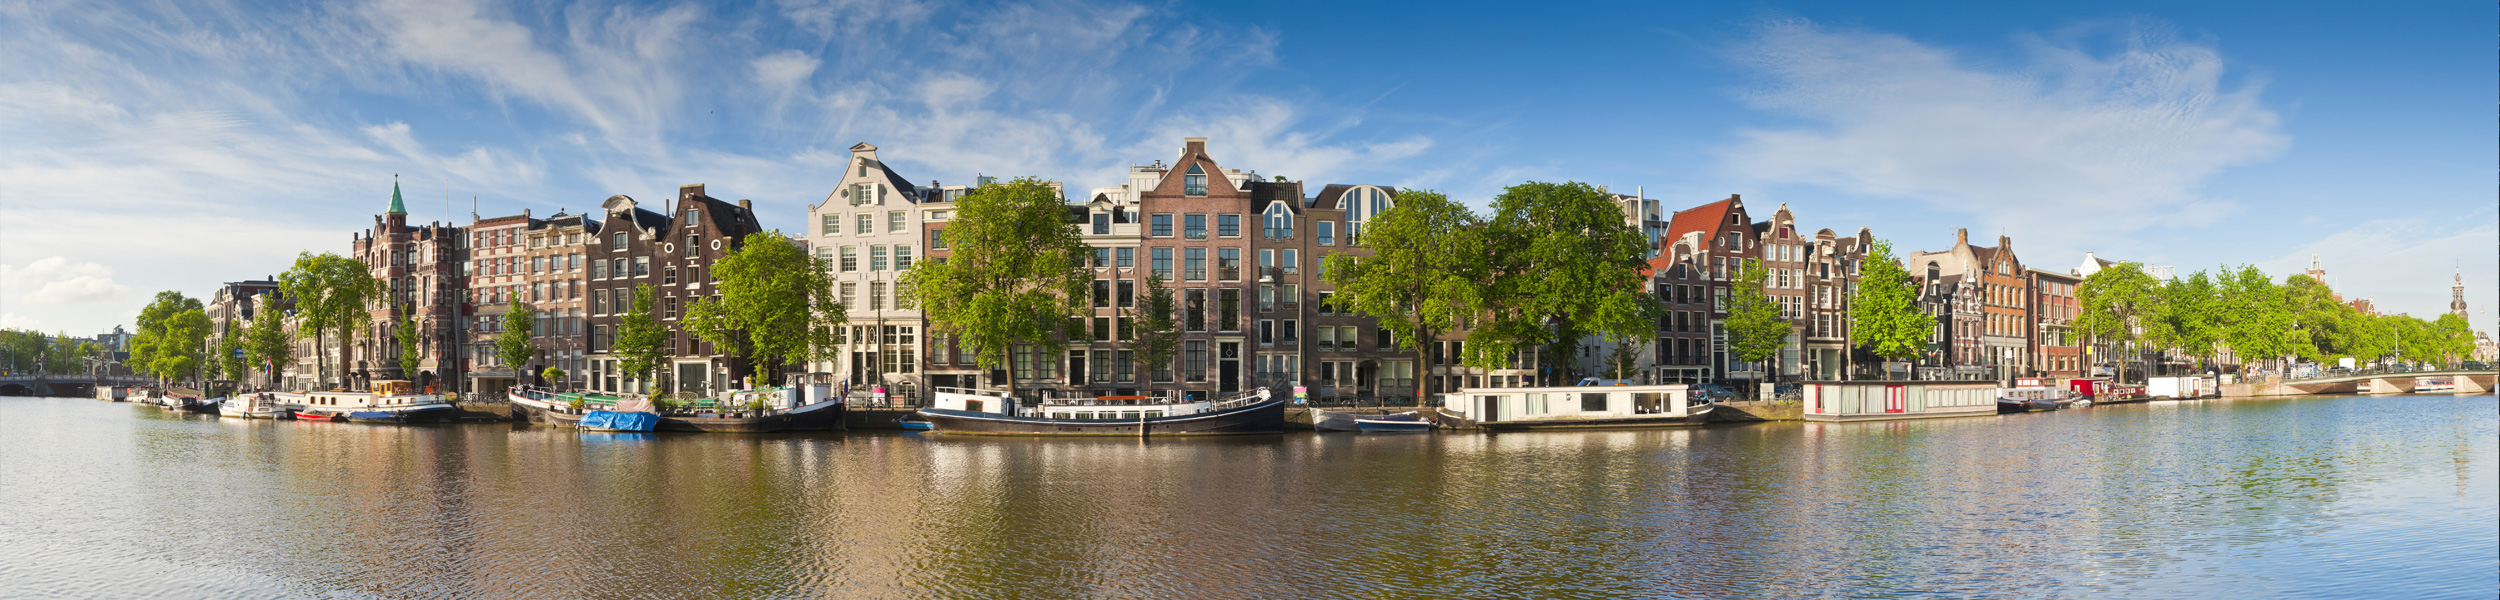 Senior JavaScript Dev Amsterdam, the Netherlands